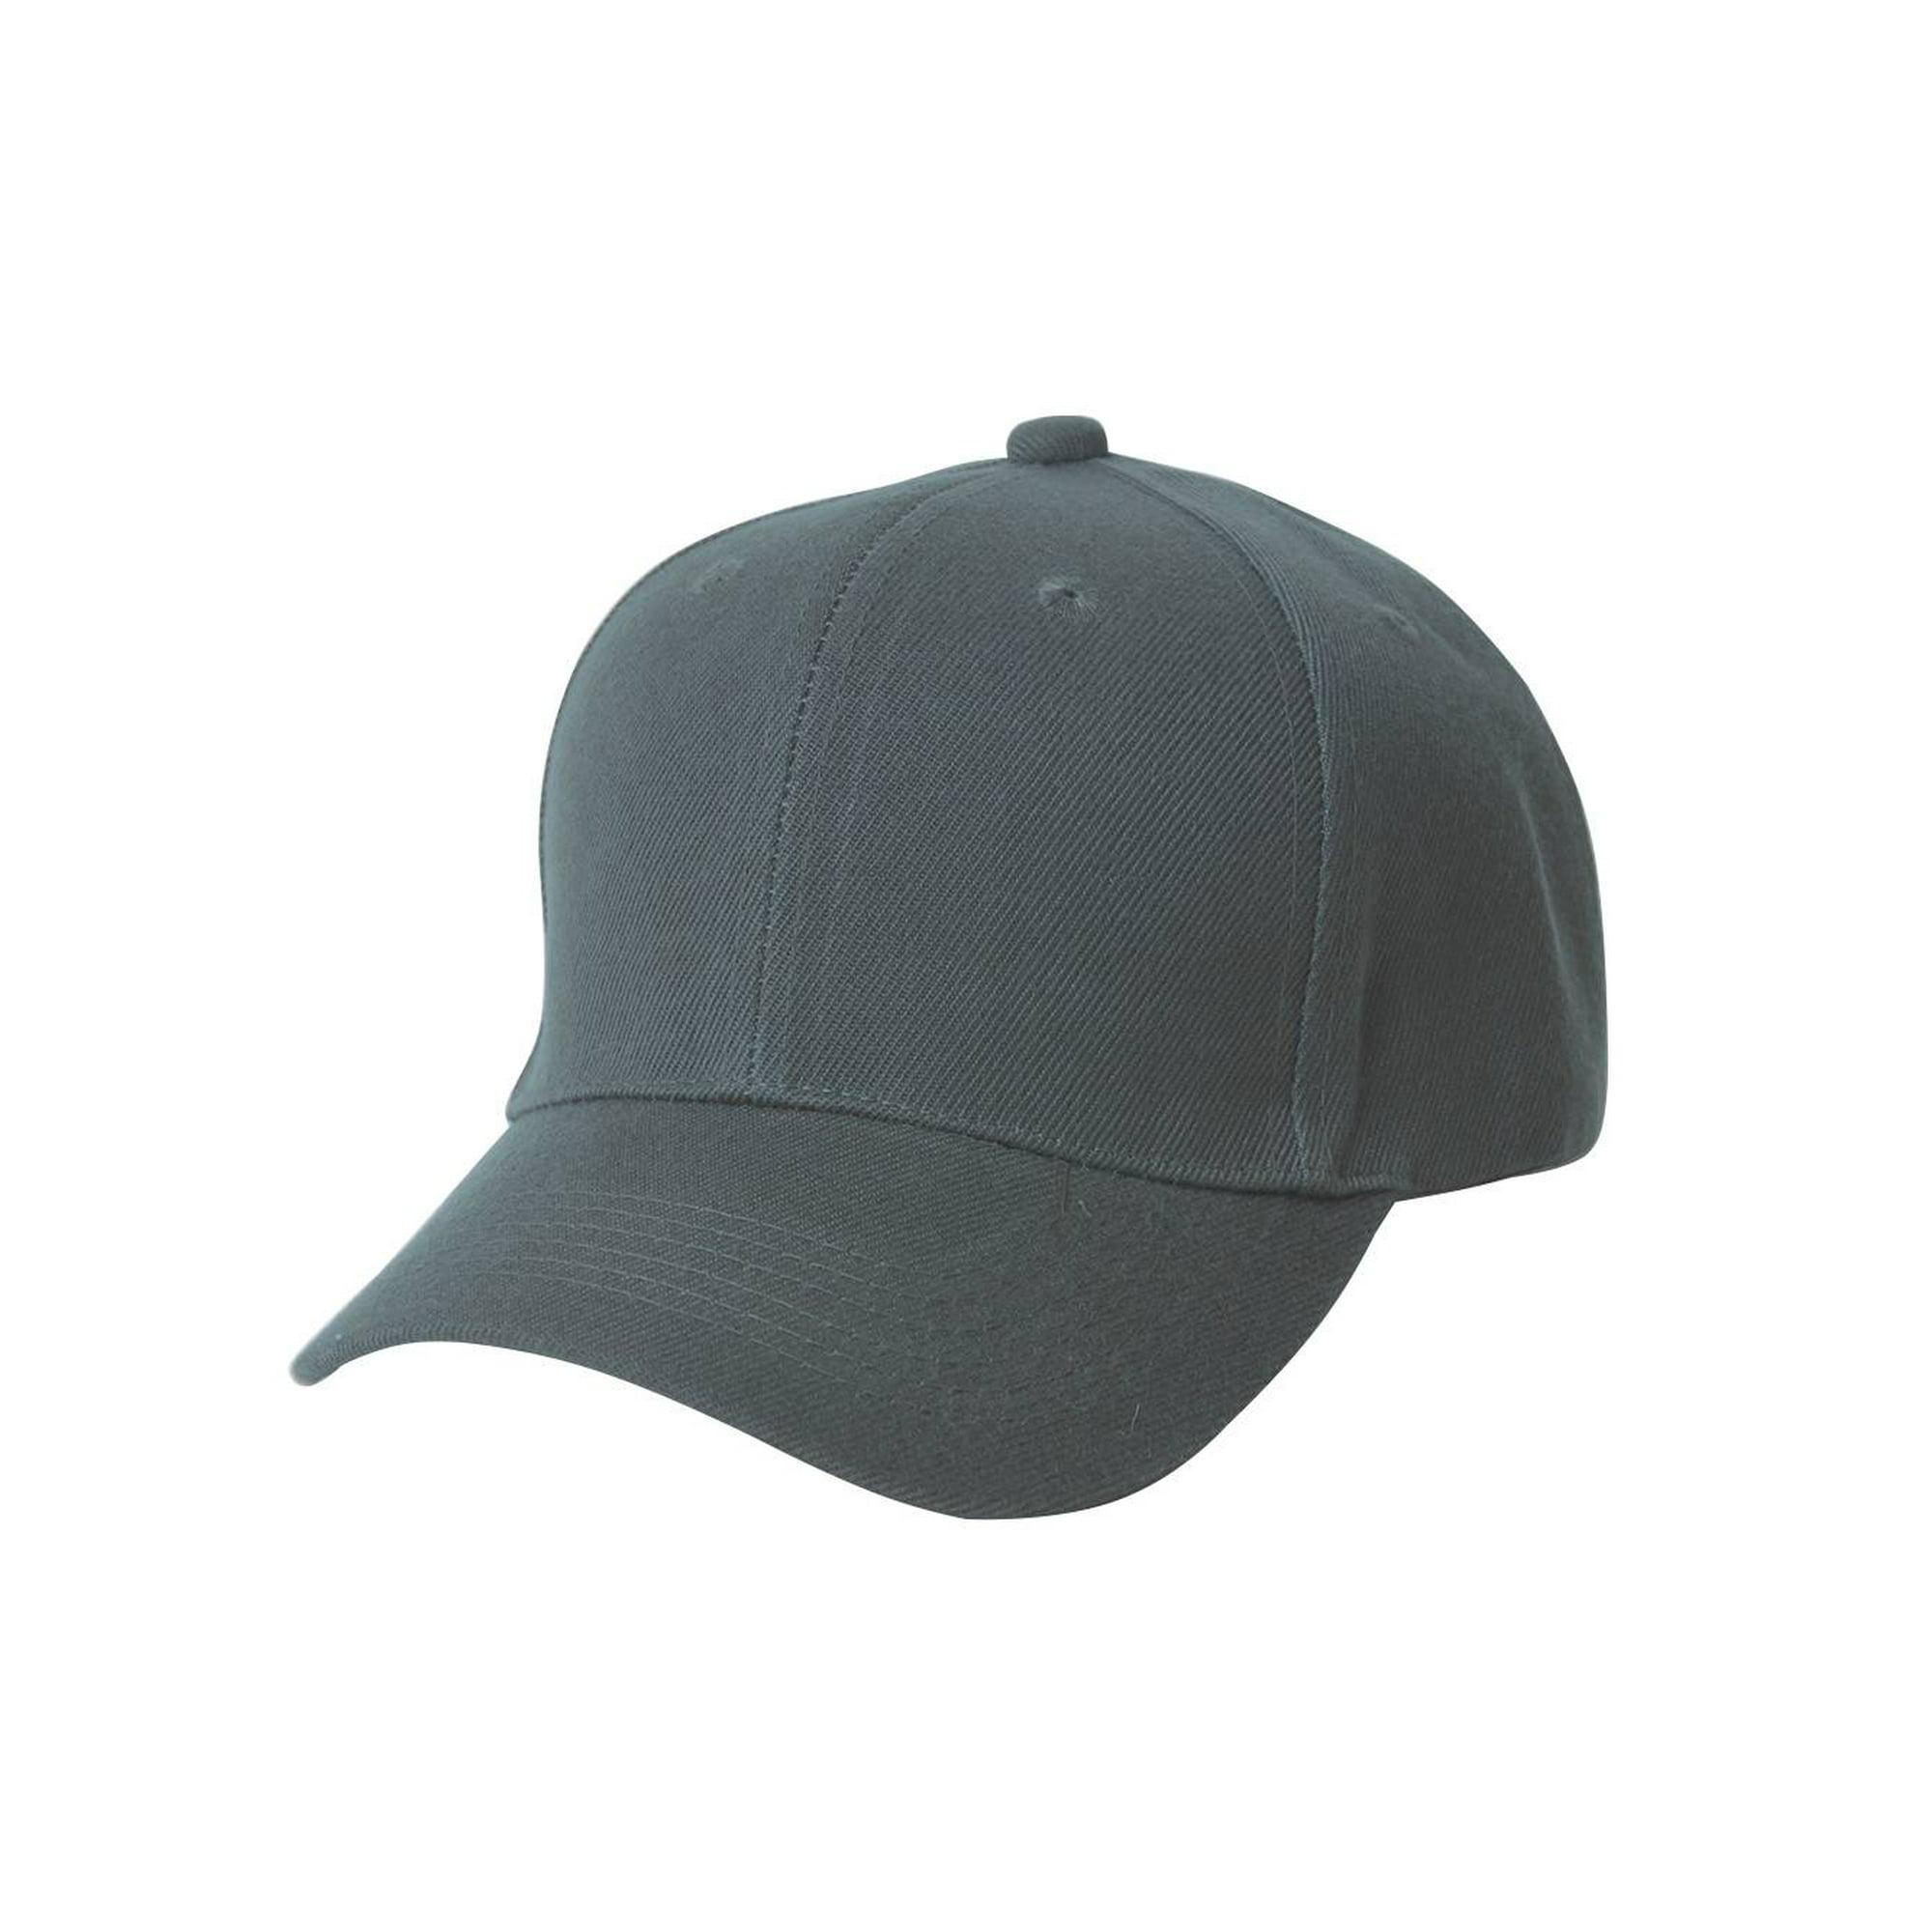 459e41570bda2 Plain Men s Baseball Hat with Adjustable Hook and Loop Closure ...